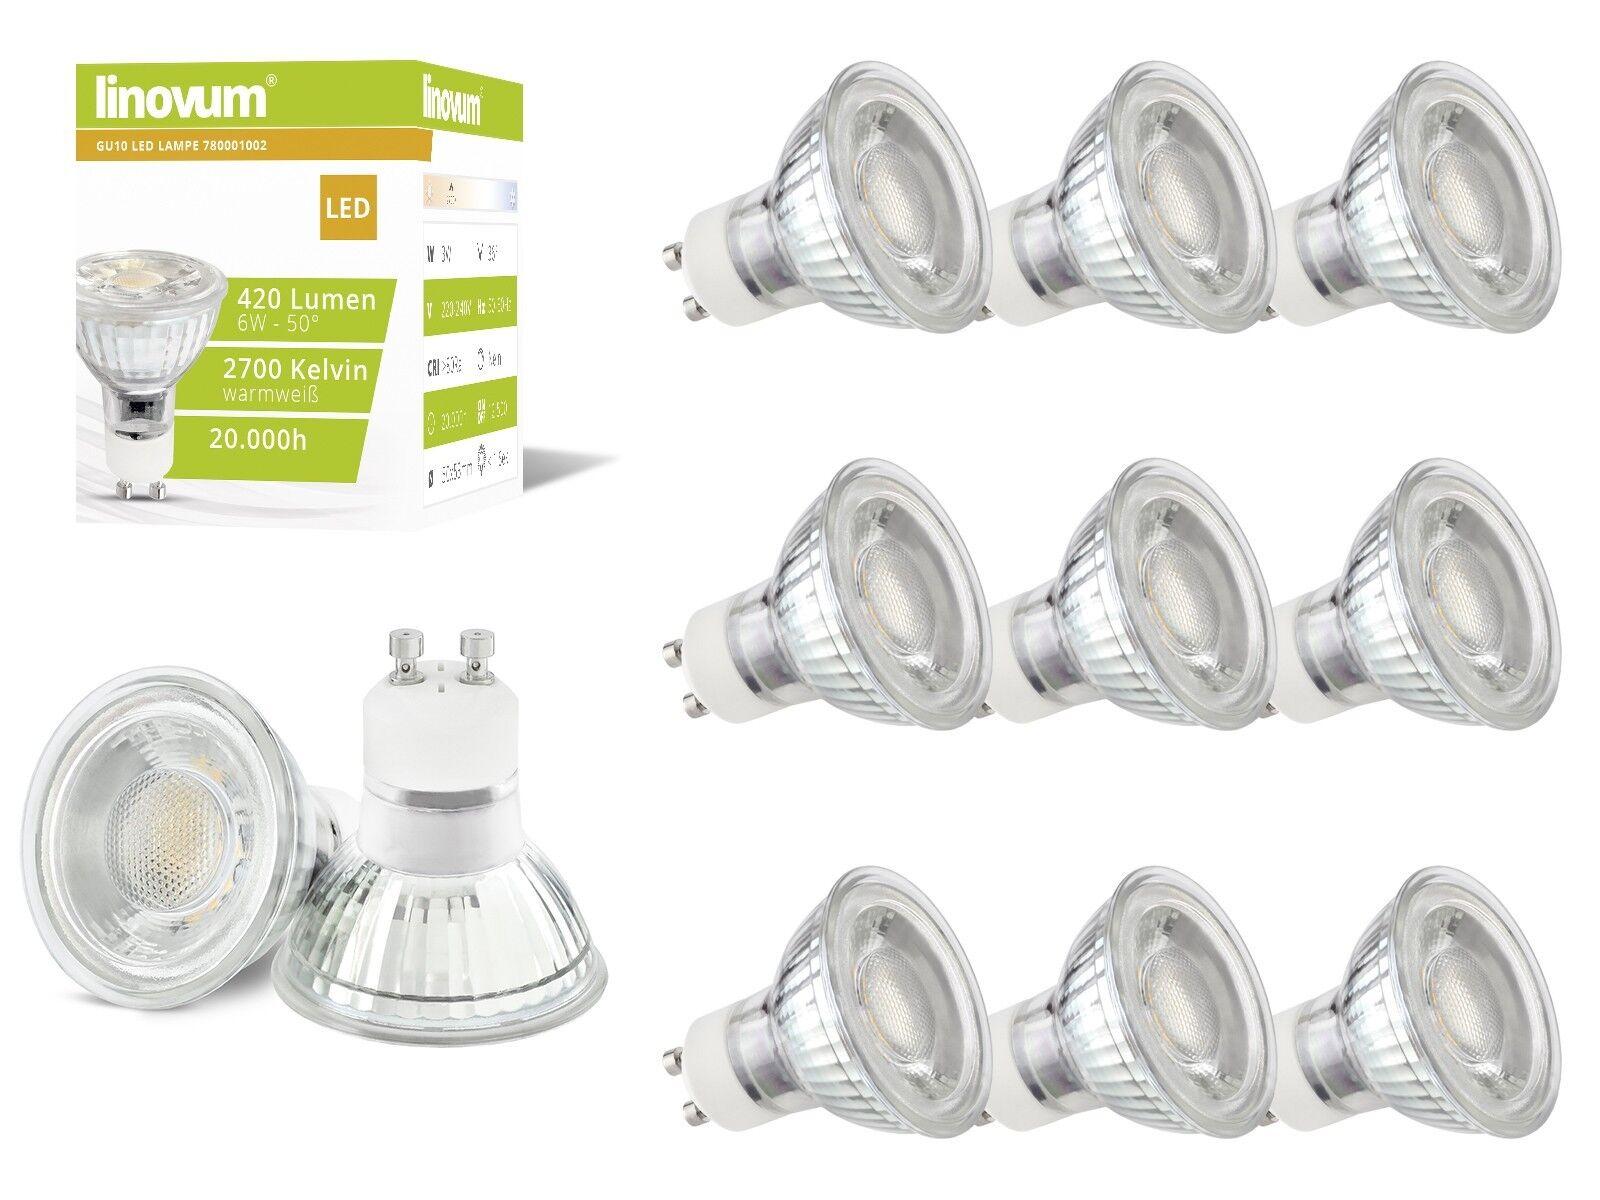 10x linovum® 6W GU10 LED Lampen Set ersetzt 50W, warmweiß 2700K LED-Leuchtmittel